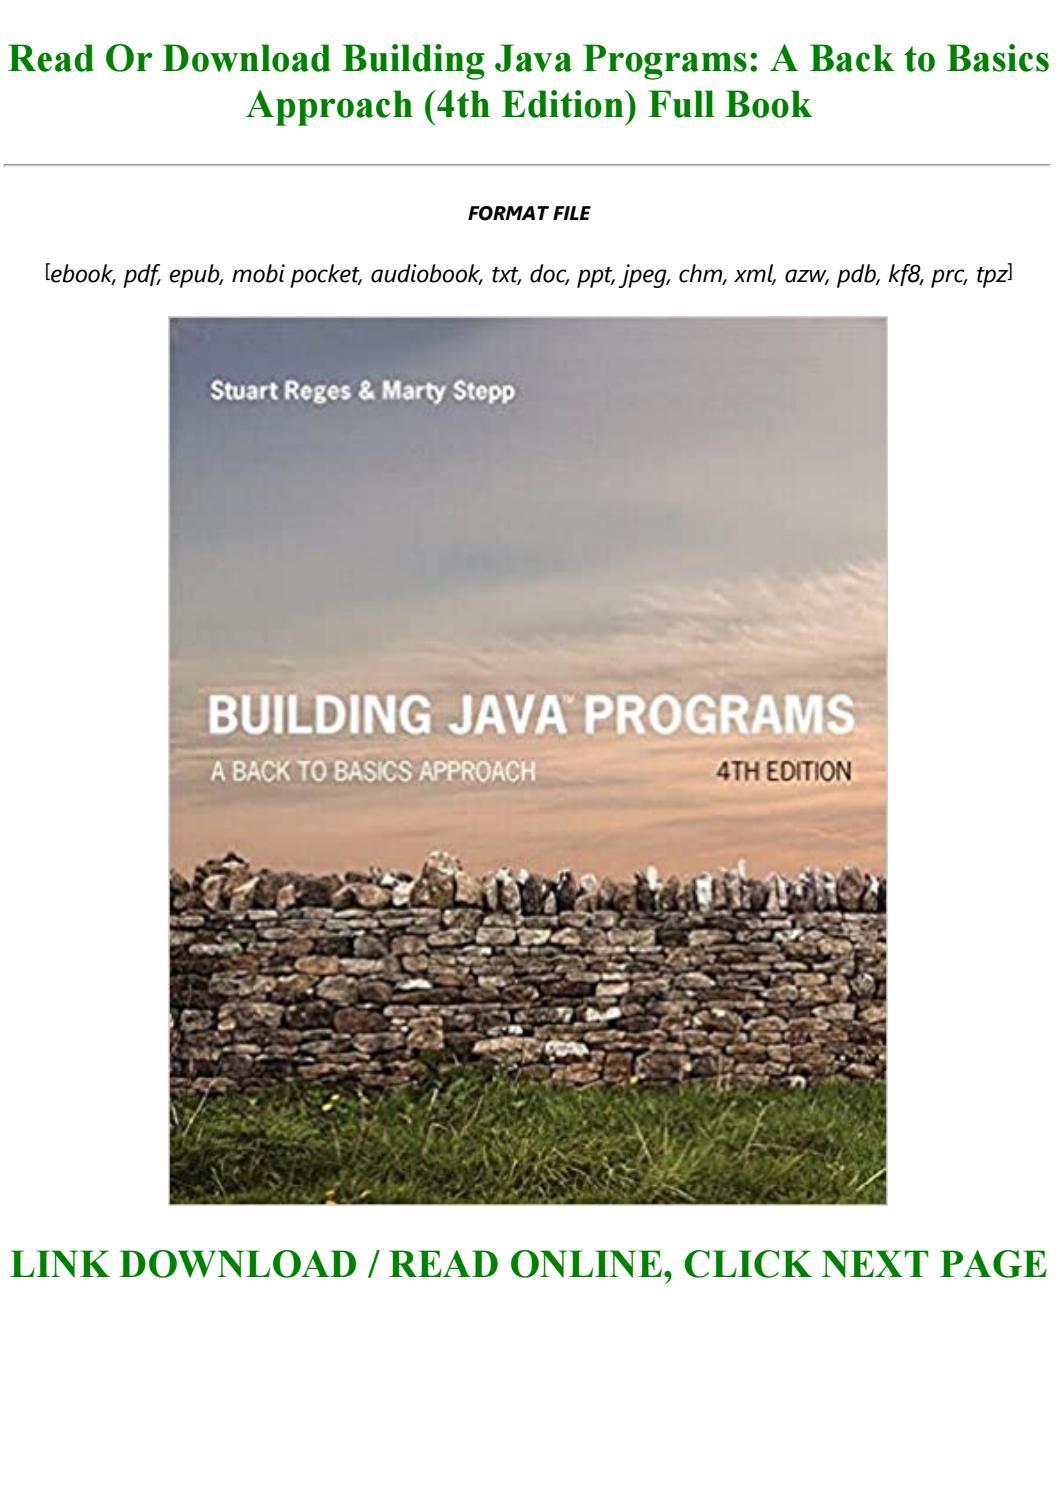 Building Java Programs 4th Edition Pdf